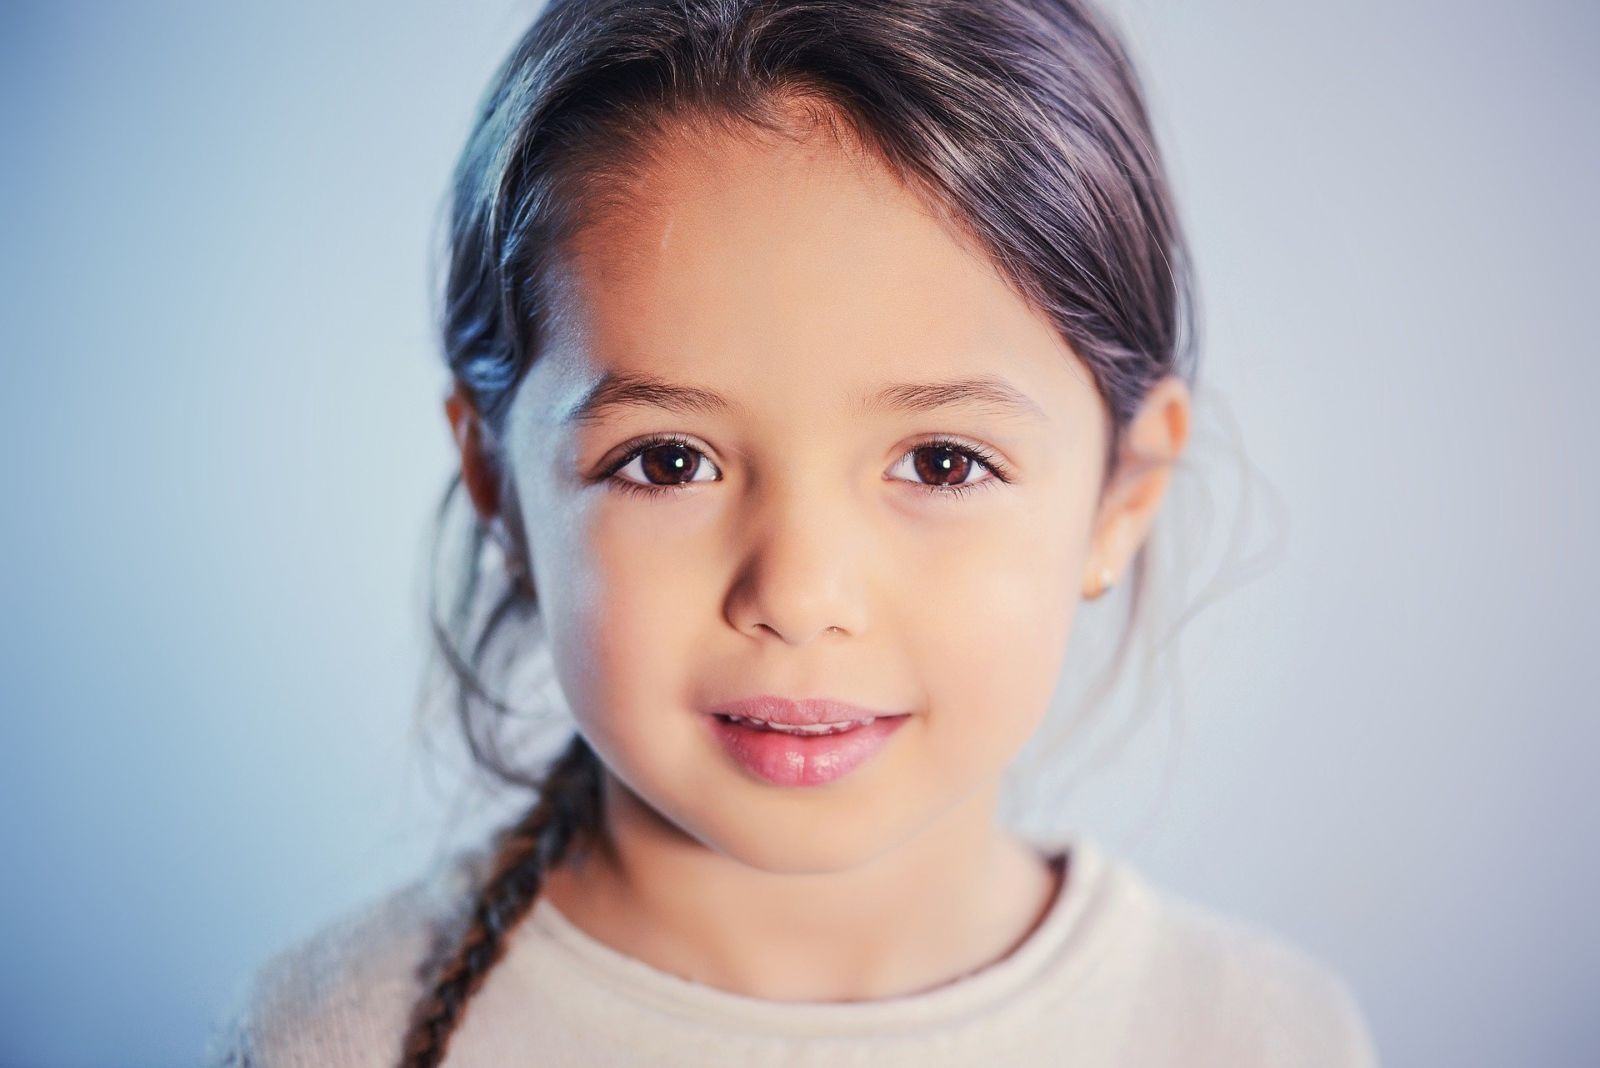 gezichtsanalyse kind